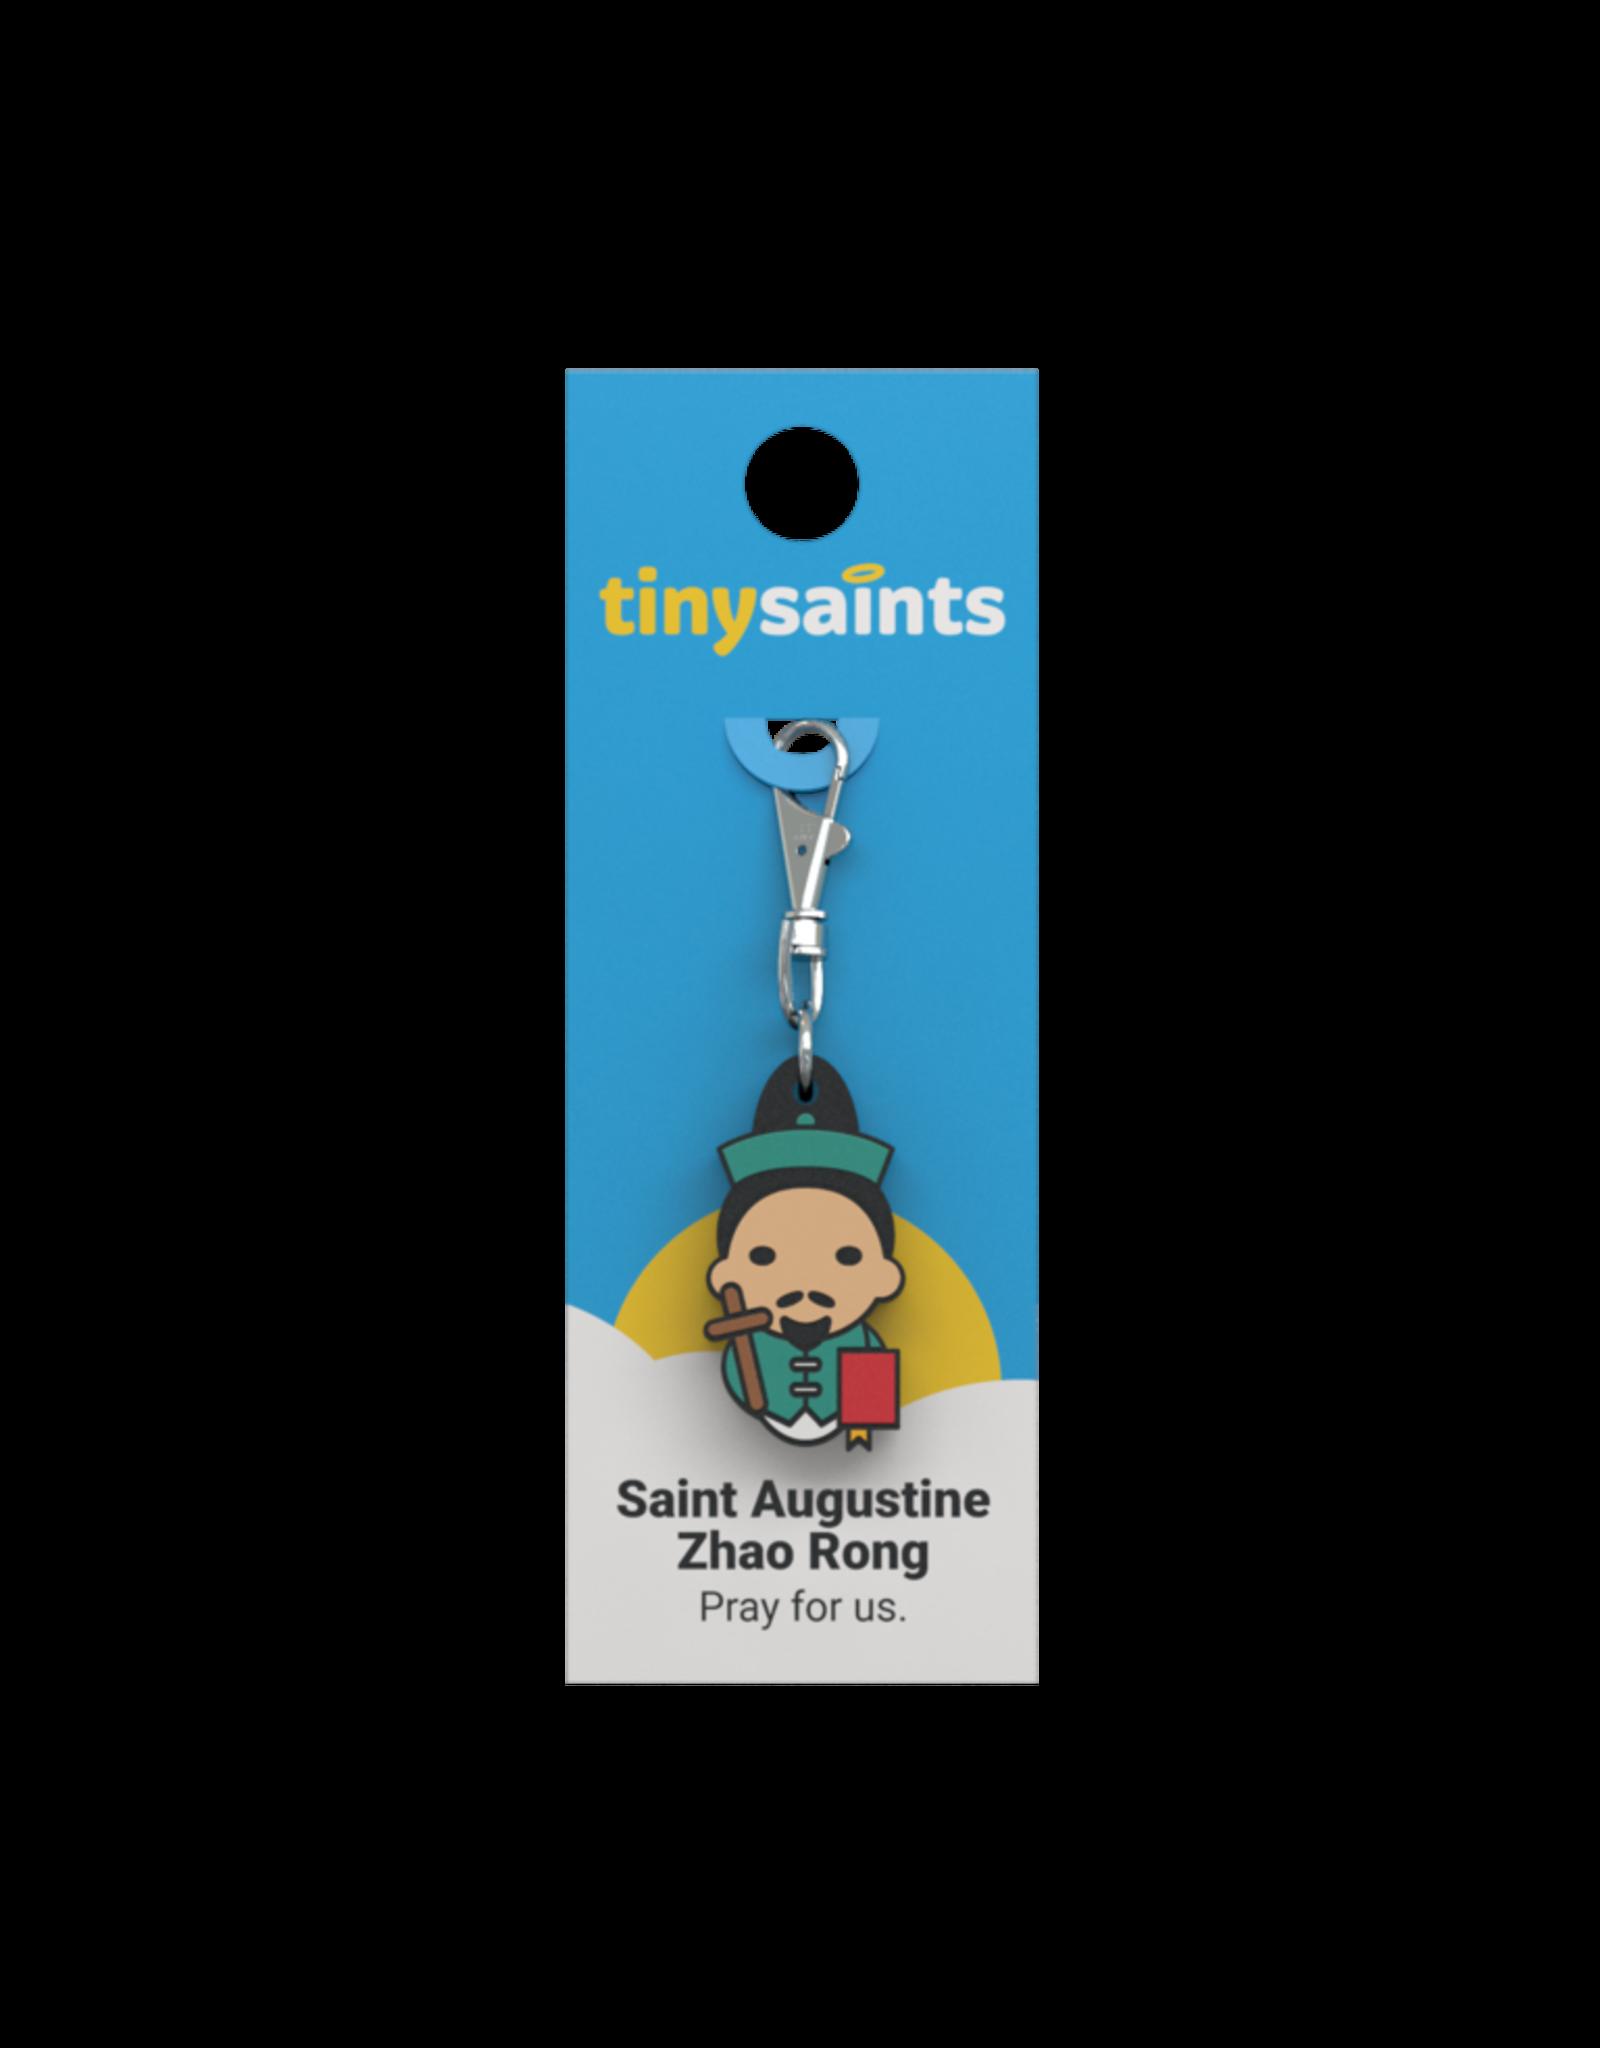 Tiny Saints Tiny Saints Charm - St Augustine Zhao Rong